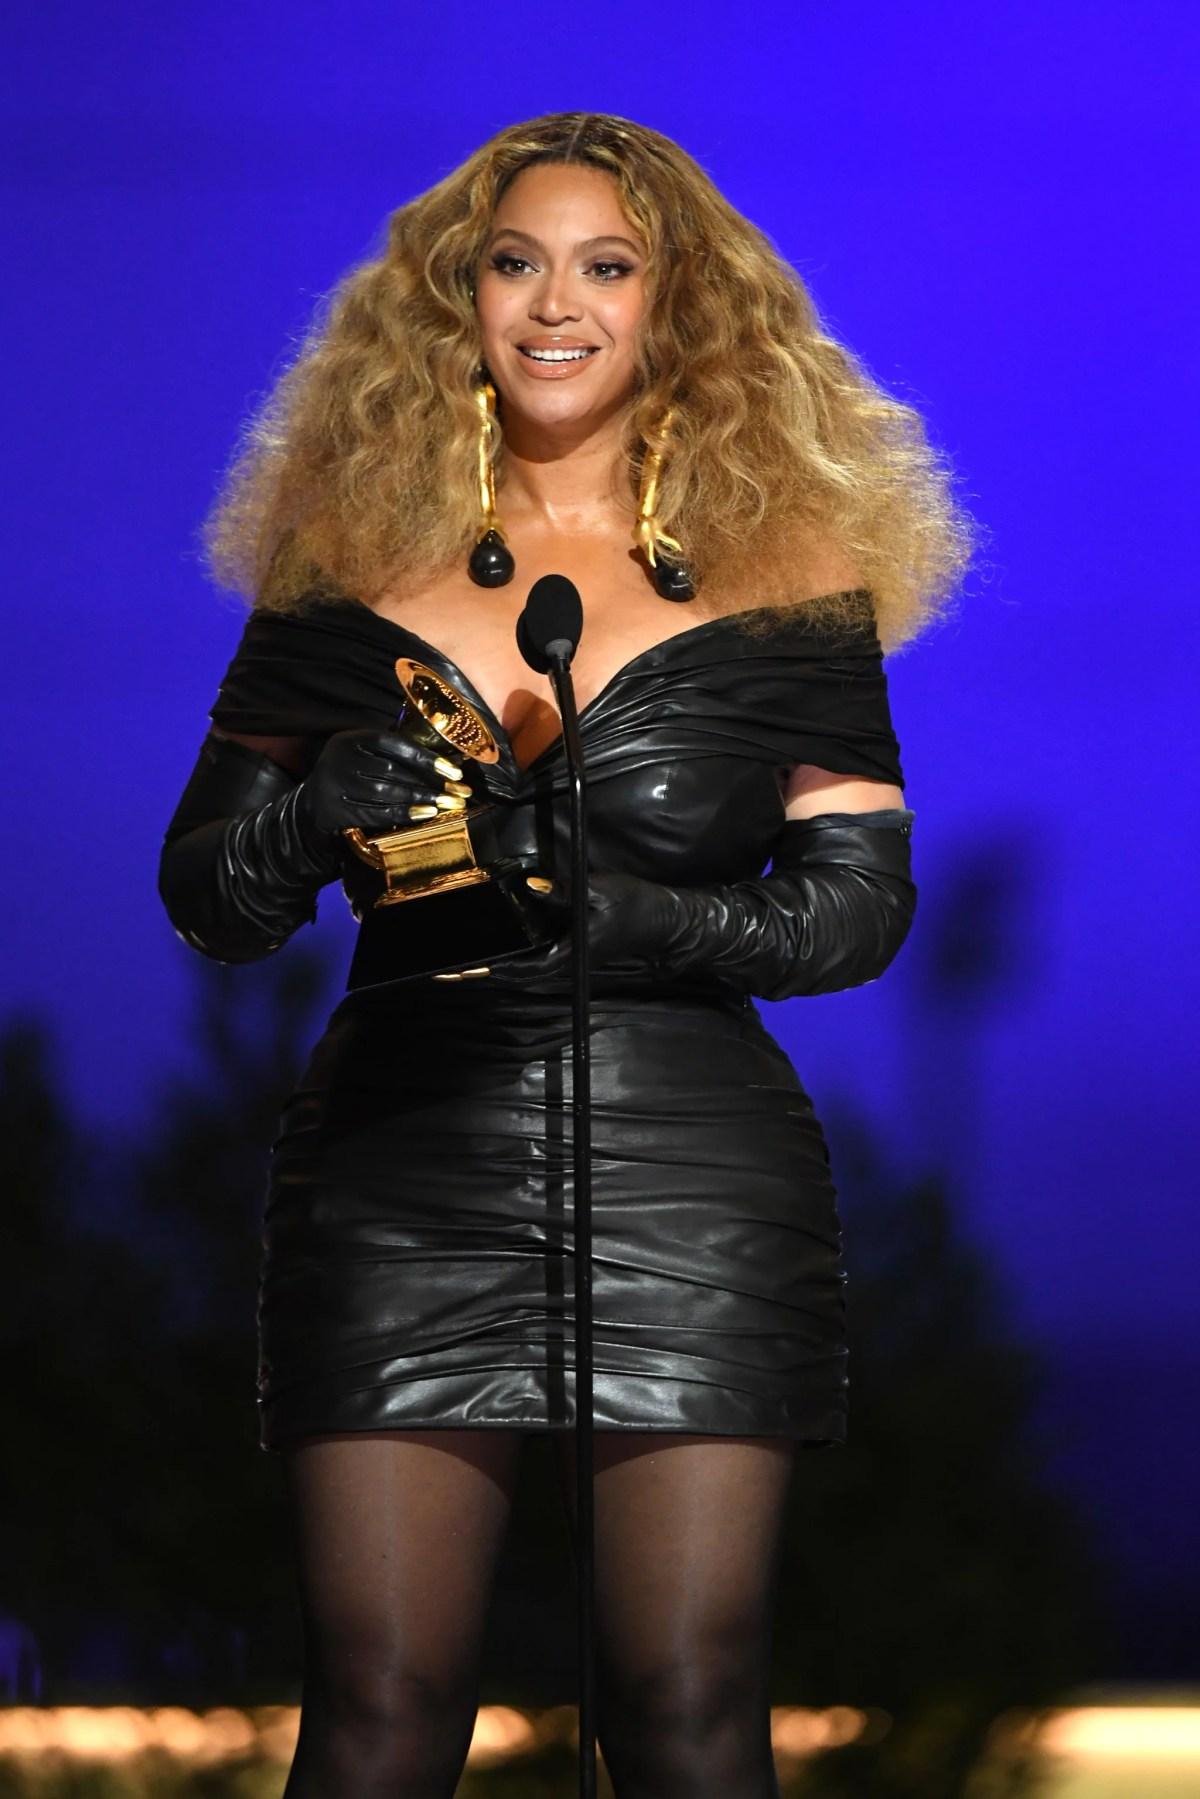 Watch Beyoncé's Acceptance Speech at Grammys 2021 | POPSUGAR Entertainment